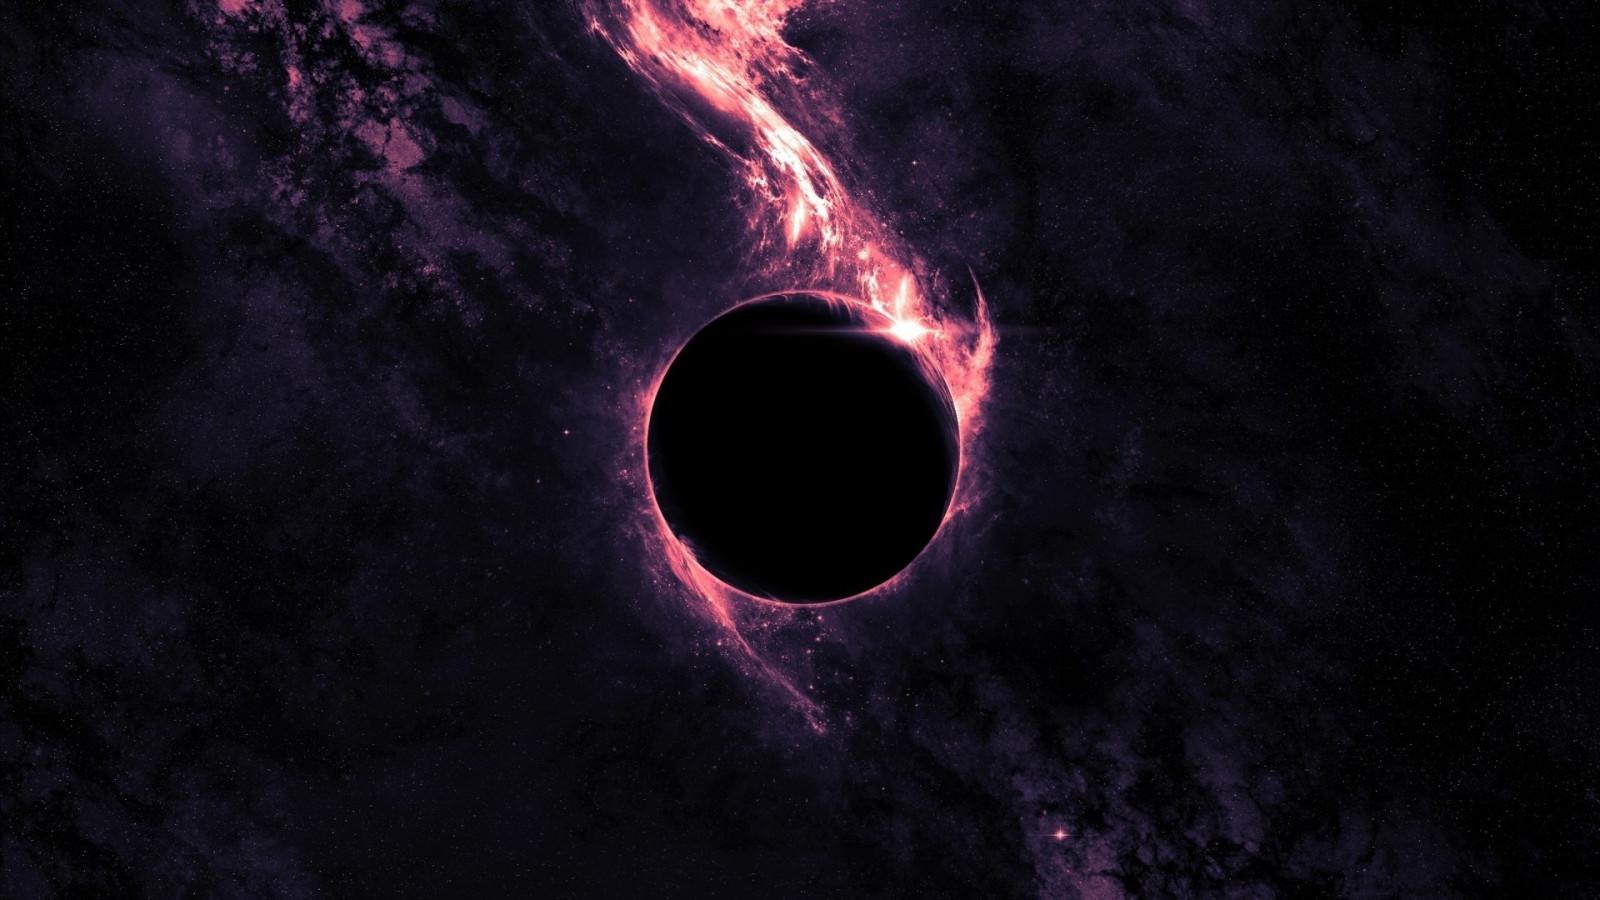 Wallpaper : 1920x1080 px, dark, planet, purple, space ...